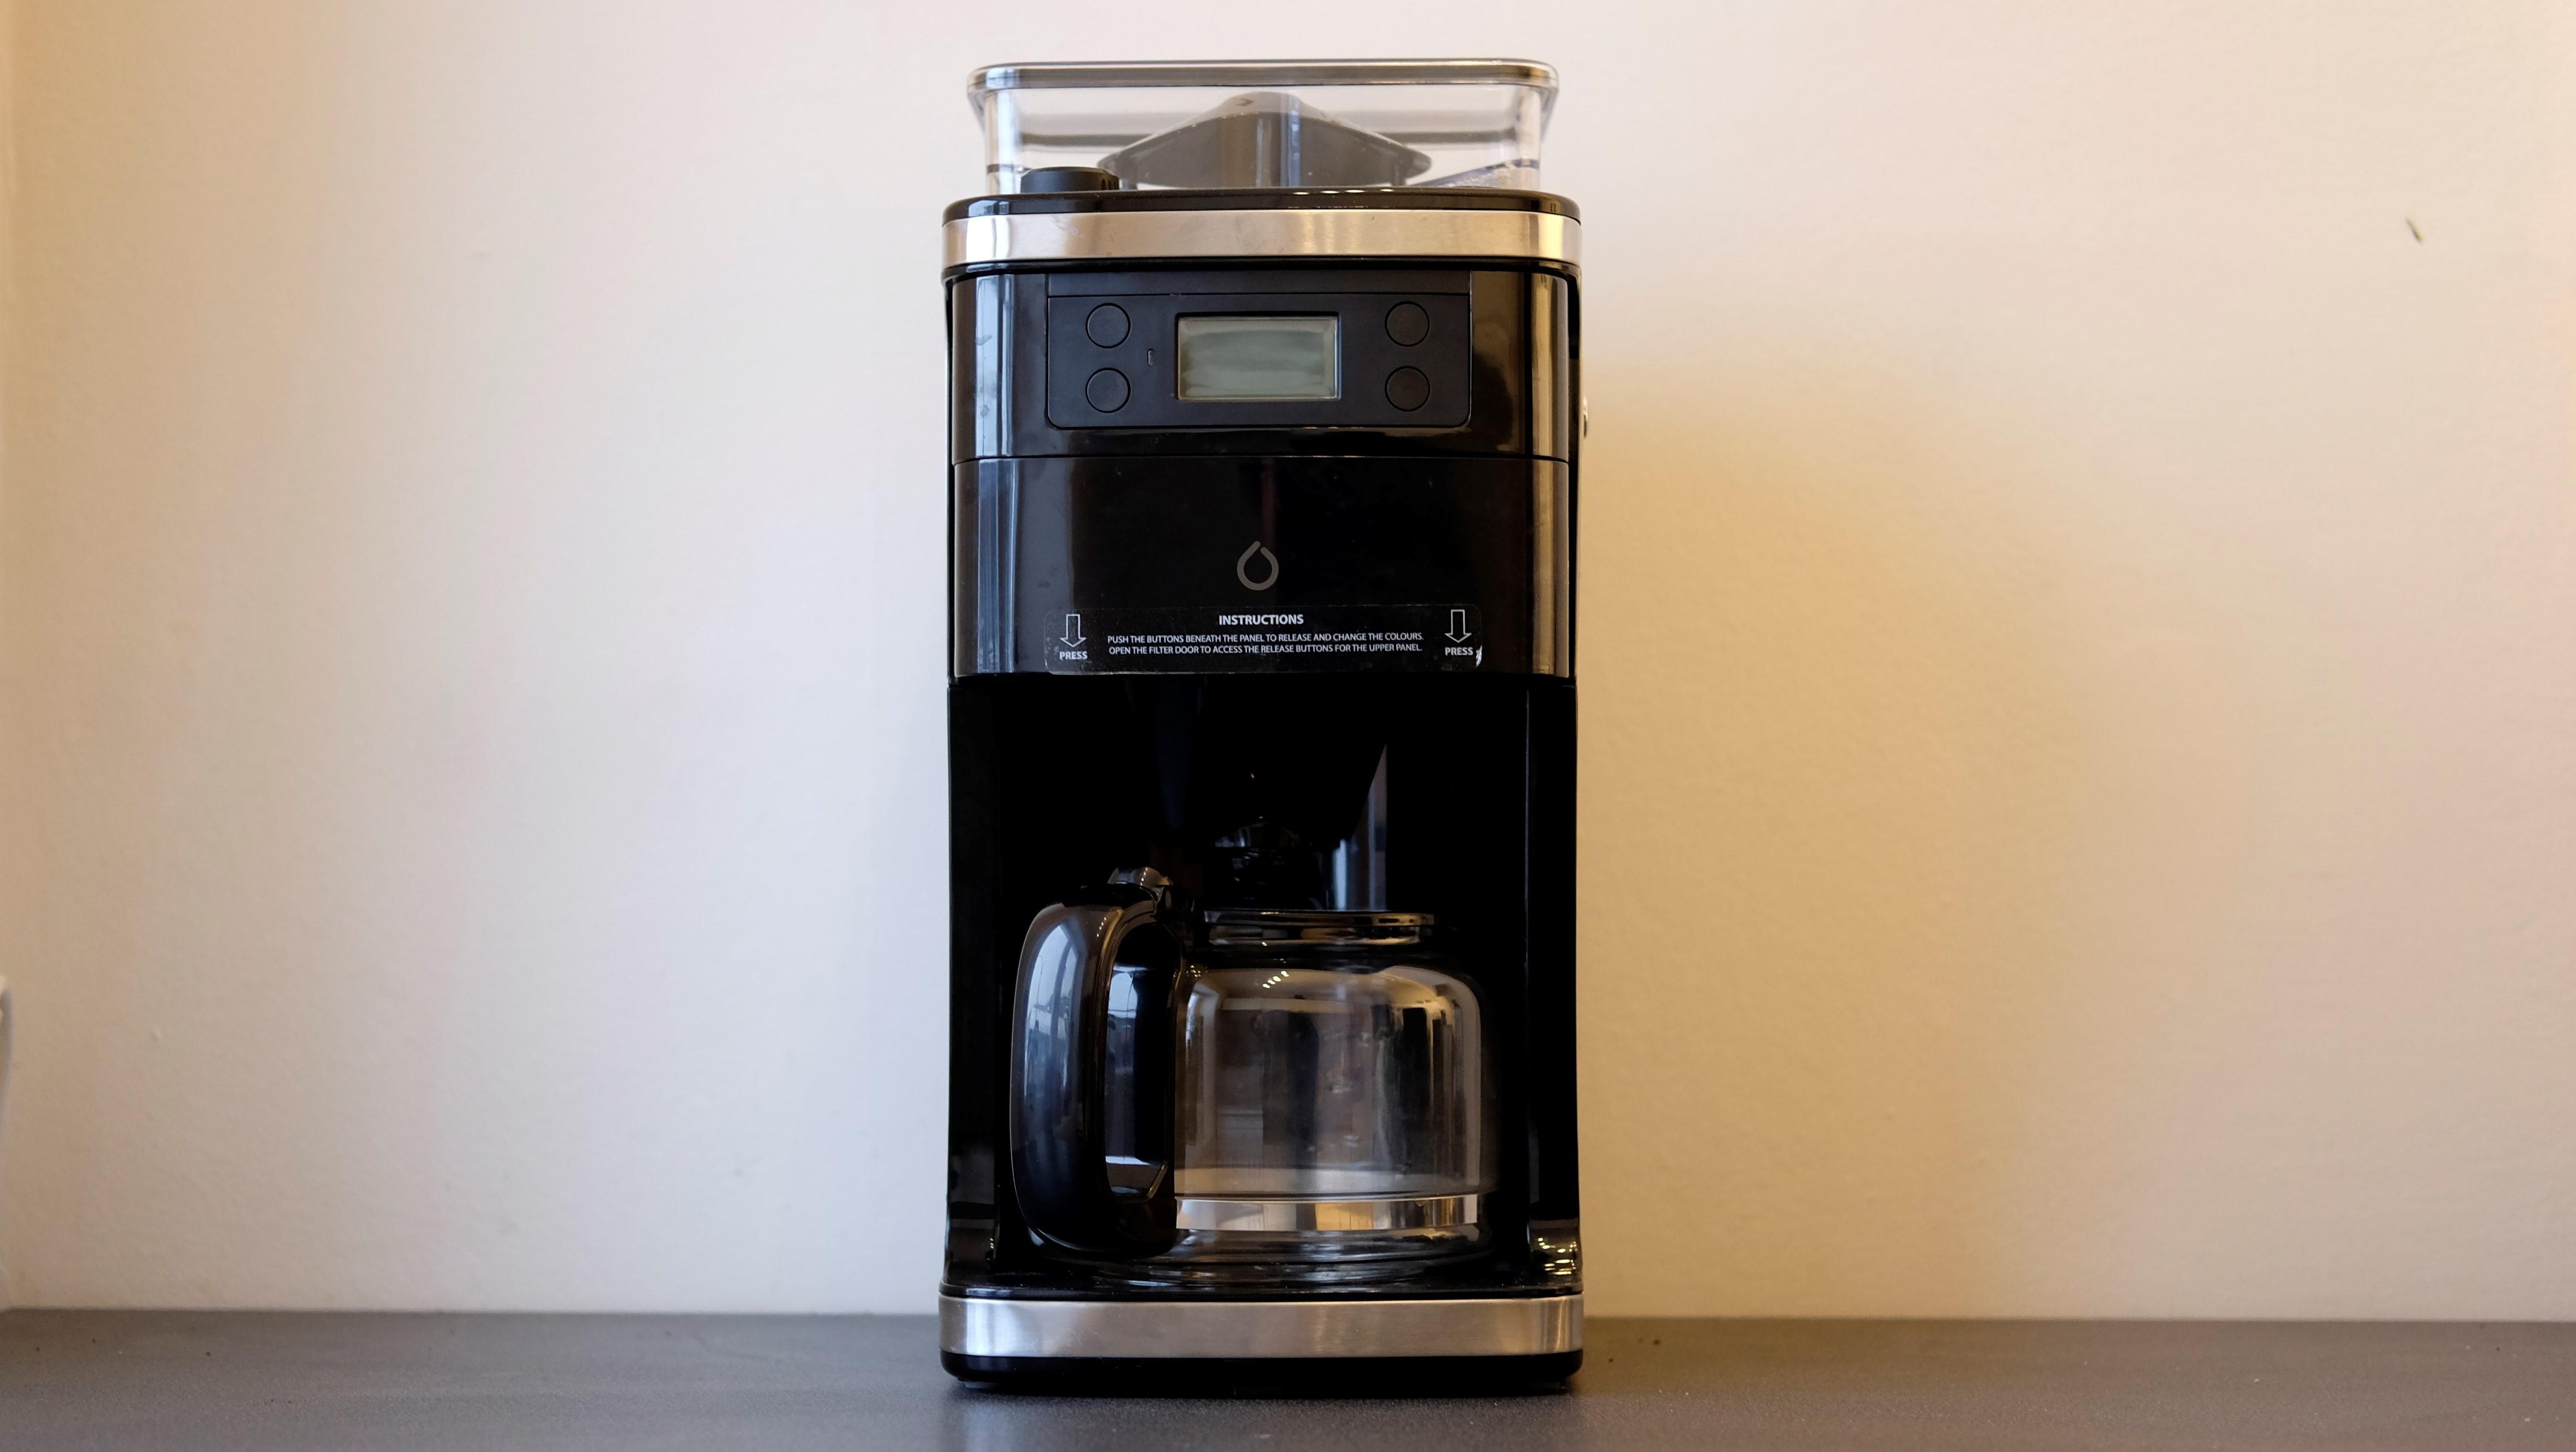 Smarter Coffee er stor.